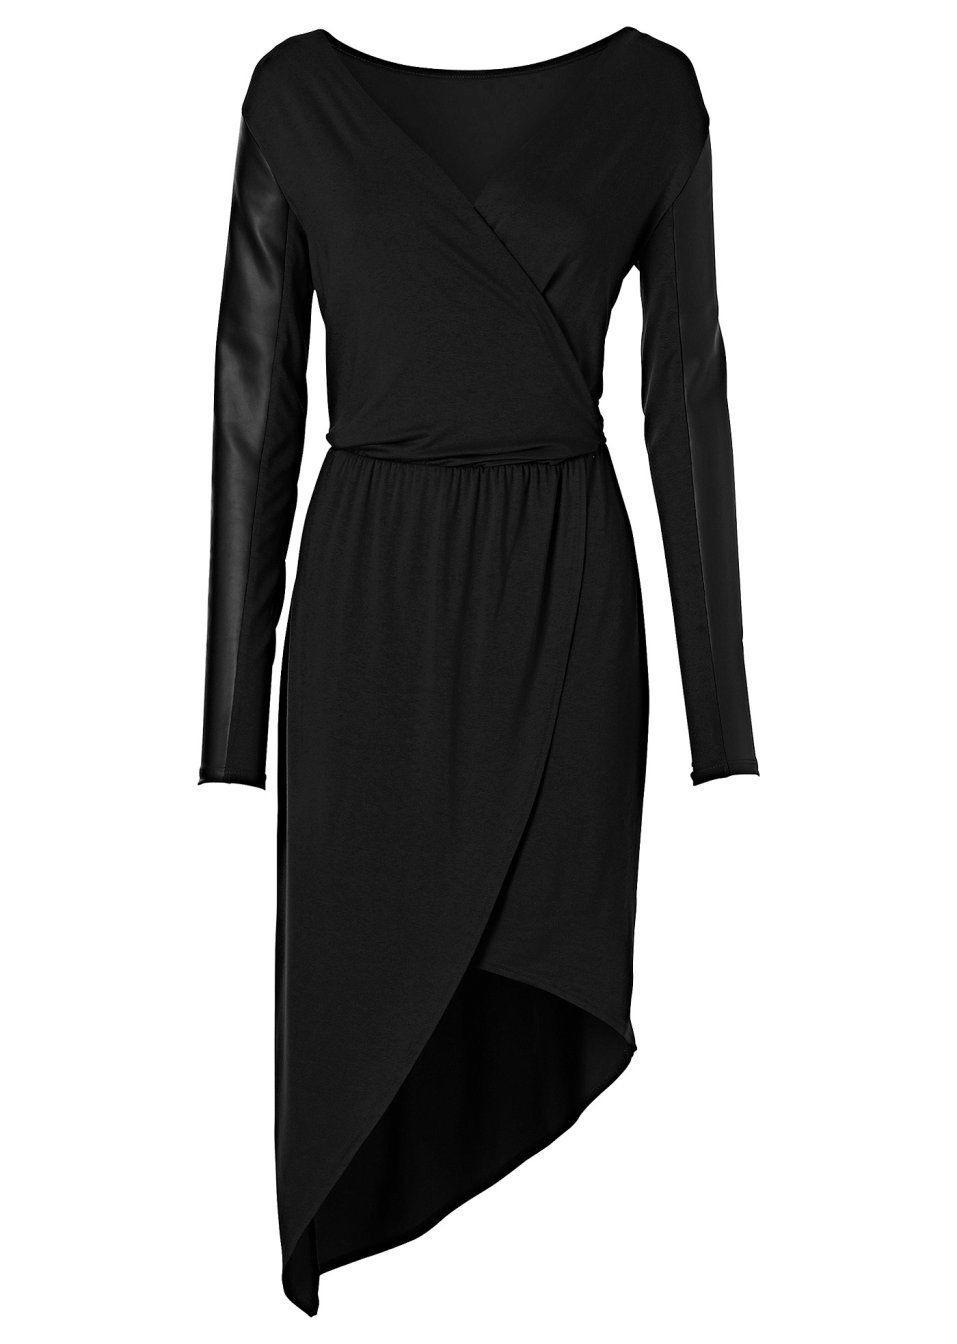 15 Großartig Wickelkleid Abendkleid StylishDesigner Coolste Wickelkleid Abendkleid Design